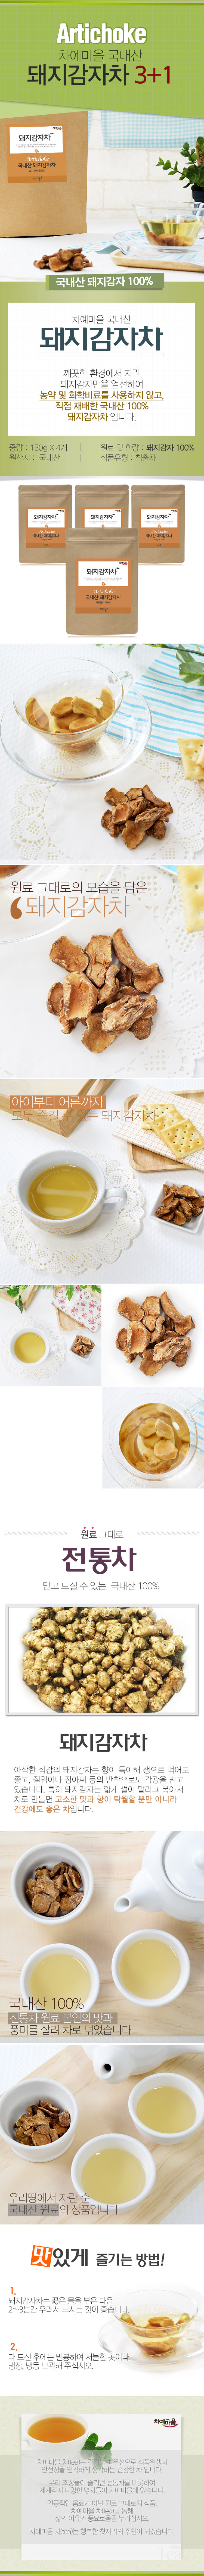 [ InterTeeHandel ] [ChayeTown]Korean Artichoke Tea 150g 3+1pcs